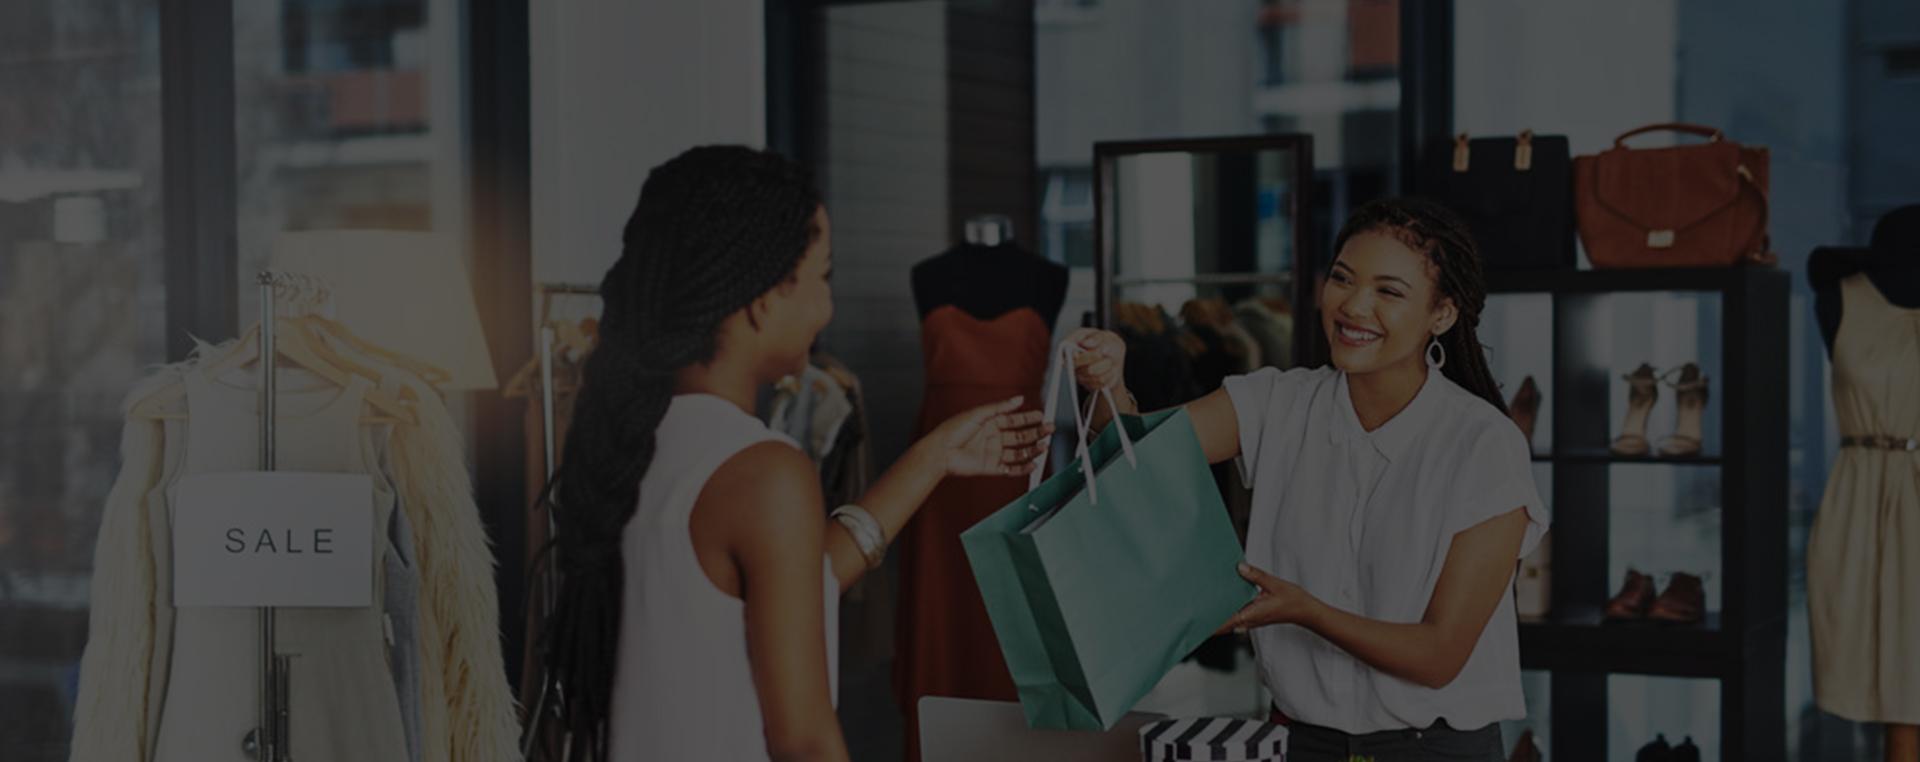 Fashion Boutique System